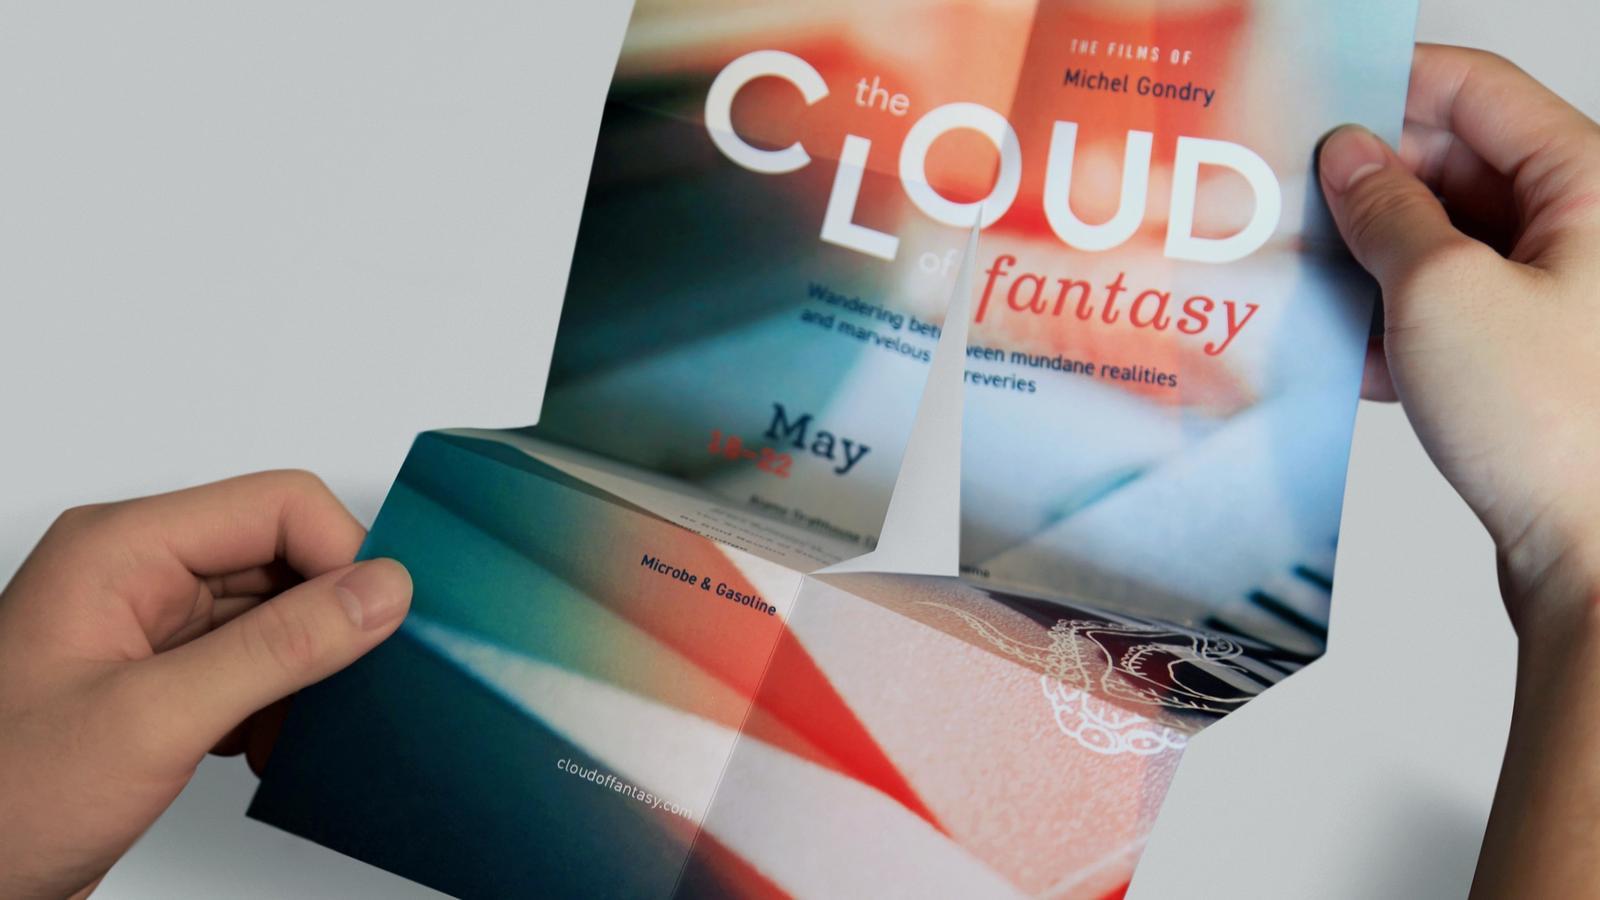 Michel Gondry Film Festival // The Cloud of Fantasy